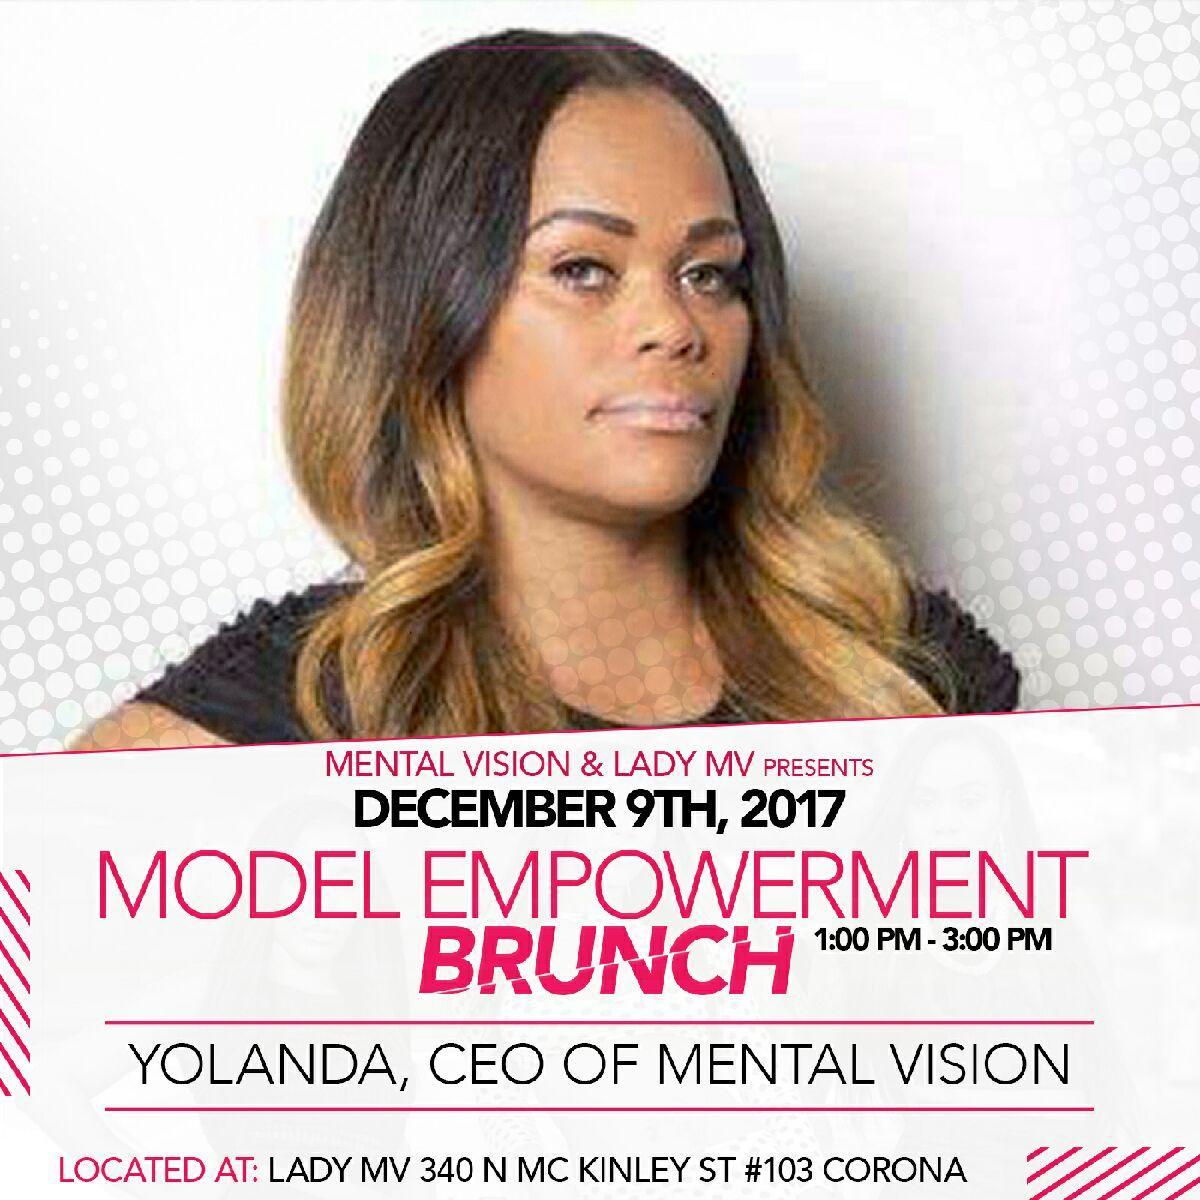 Model Empowerment Brunch - Lady MV - Panelist - Yolanda Mangum